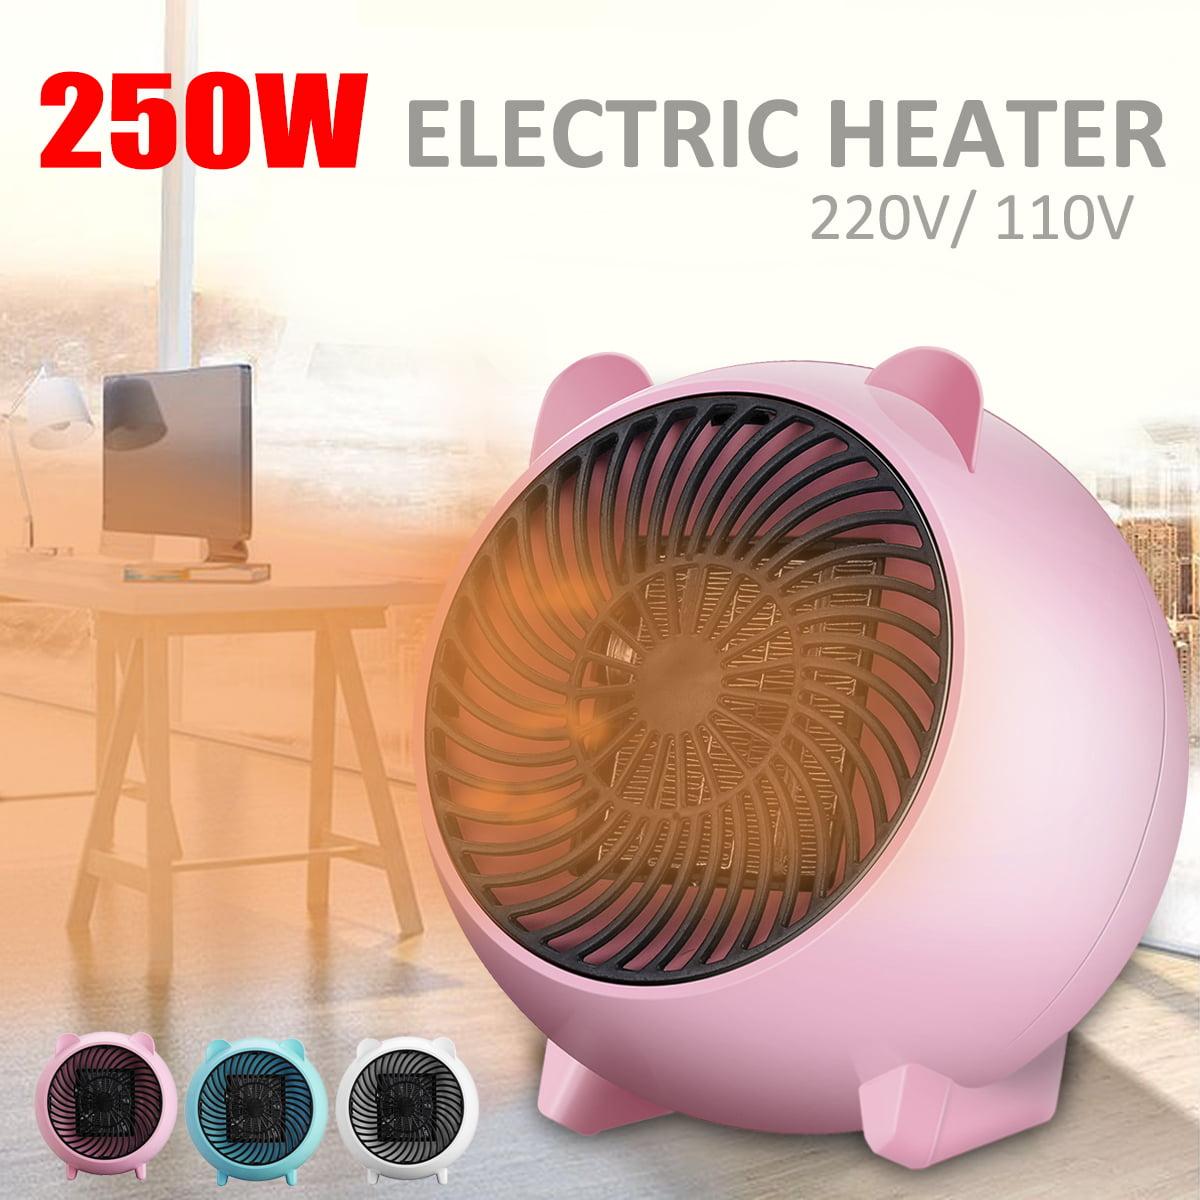 250W 10㎡ Intelligent Mini Space Electric Heater Heating Fan Warmer Home Desktop Intelligent temperature control Safety